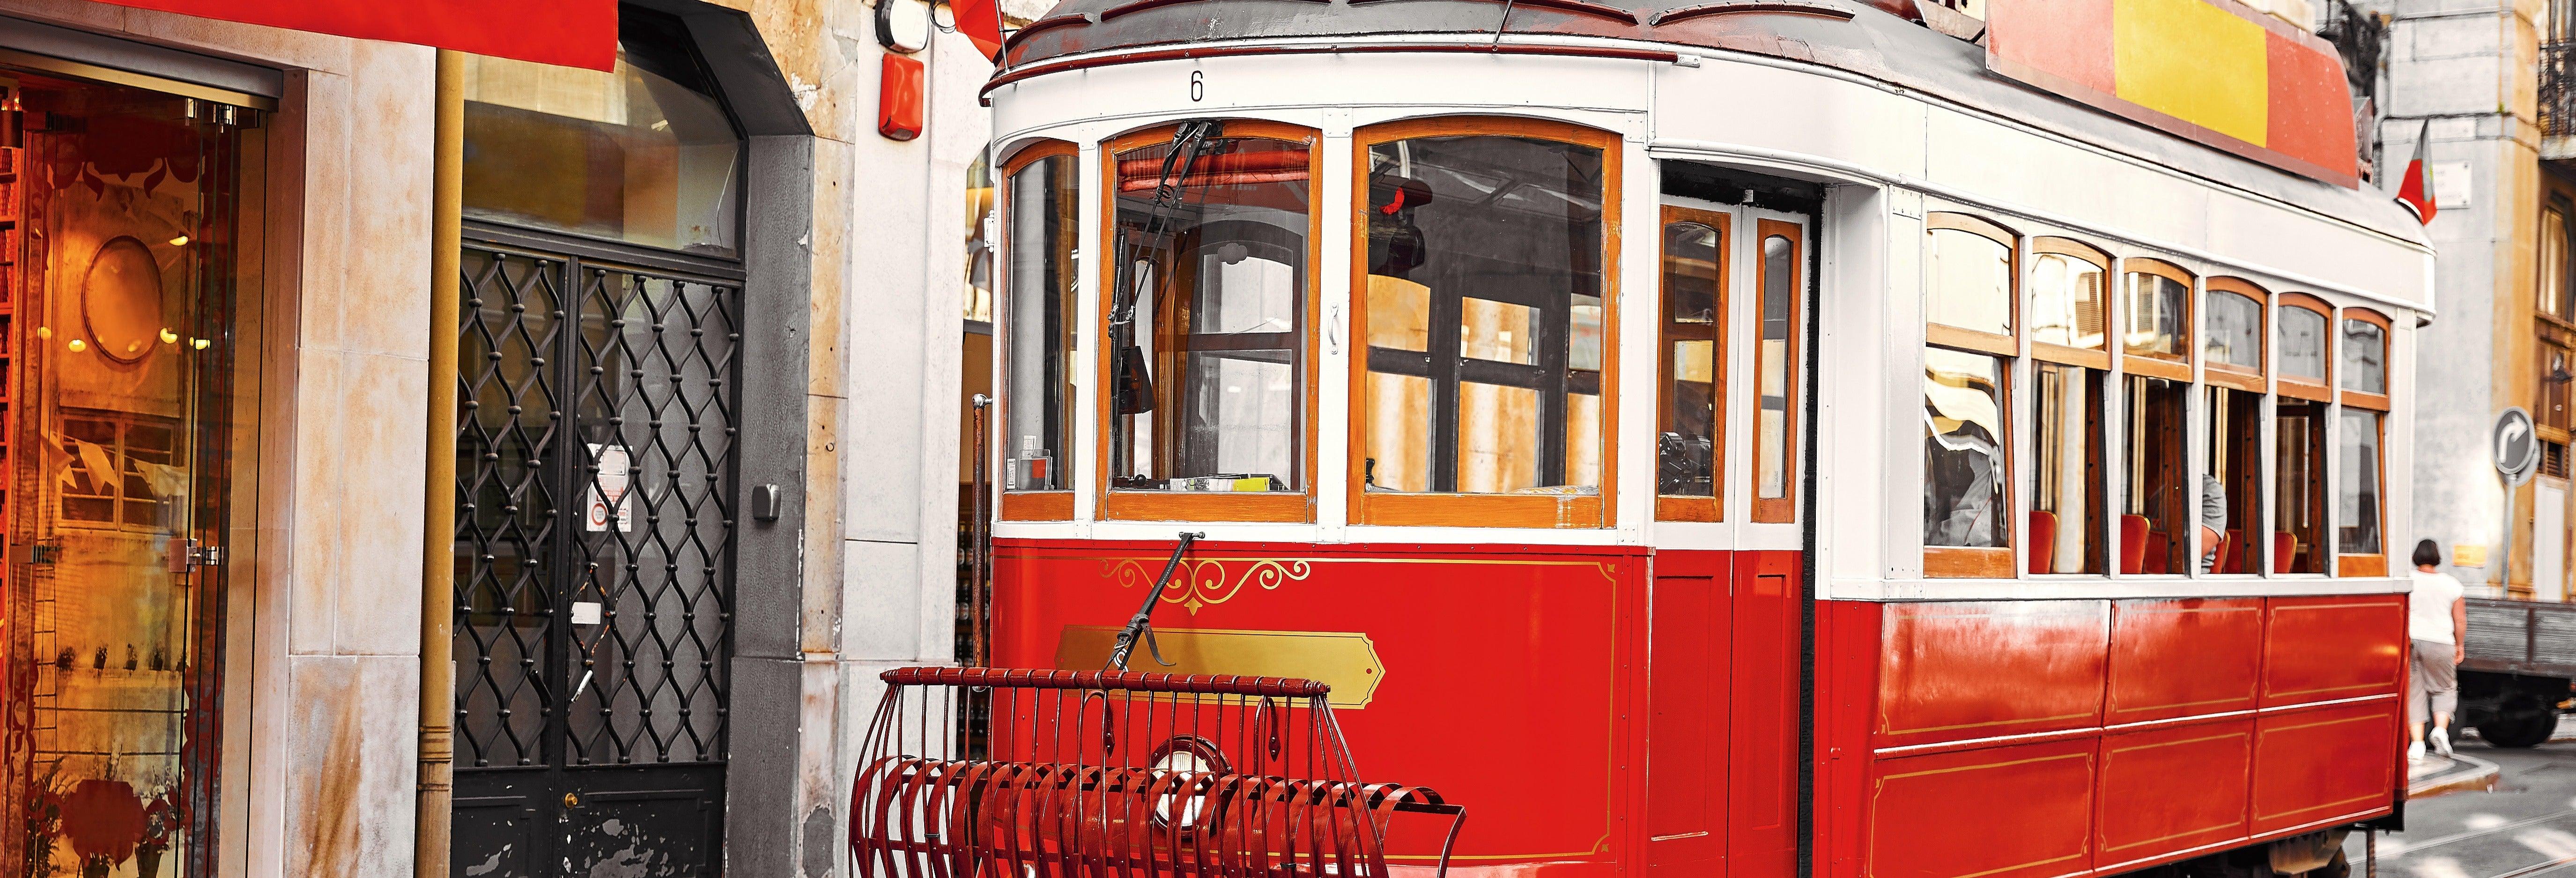 Bonde turístico de Lisboa + Elevador de Santa Justa e funiculares